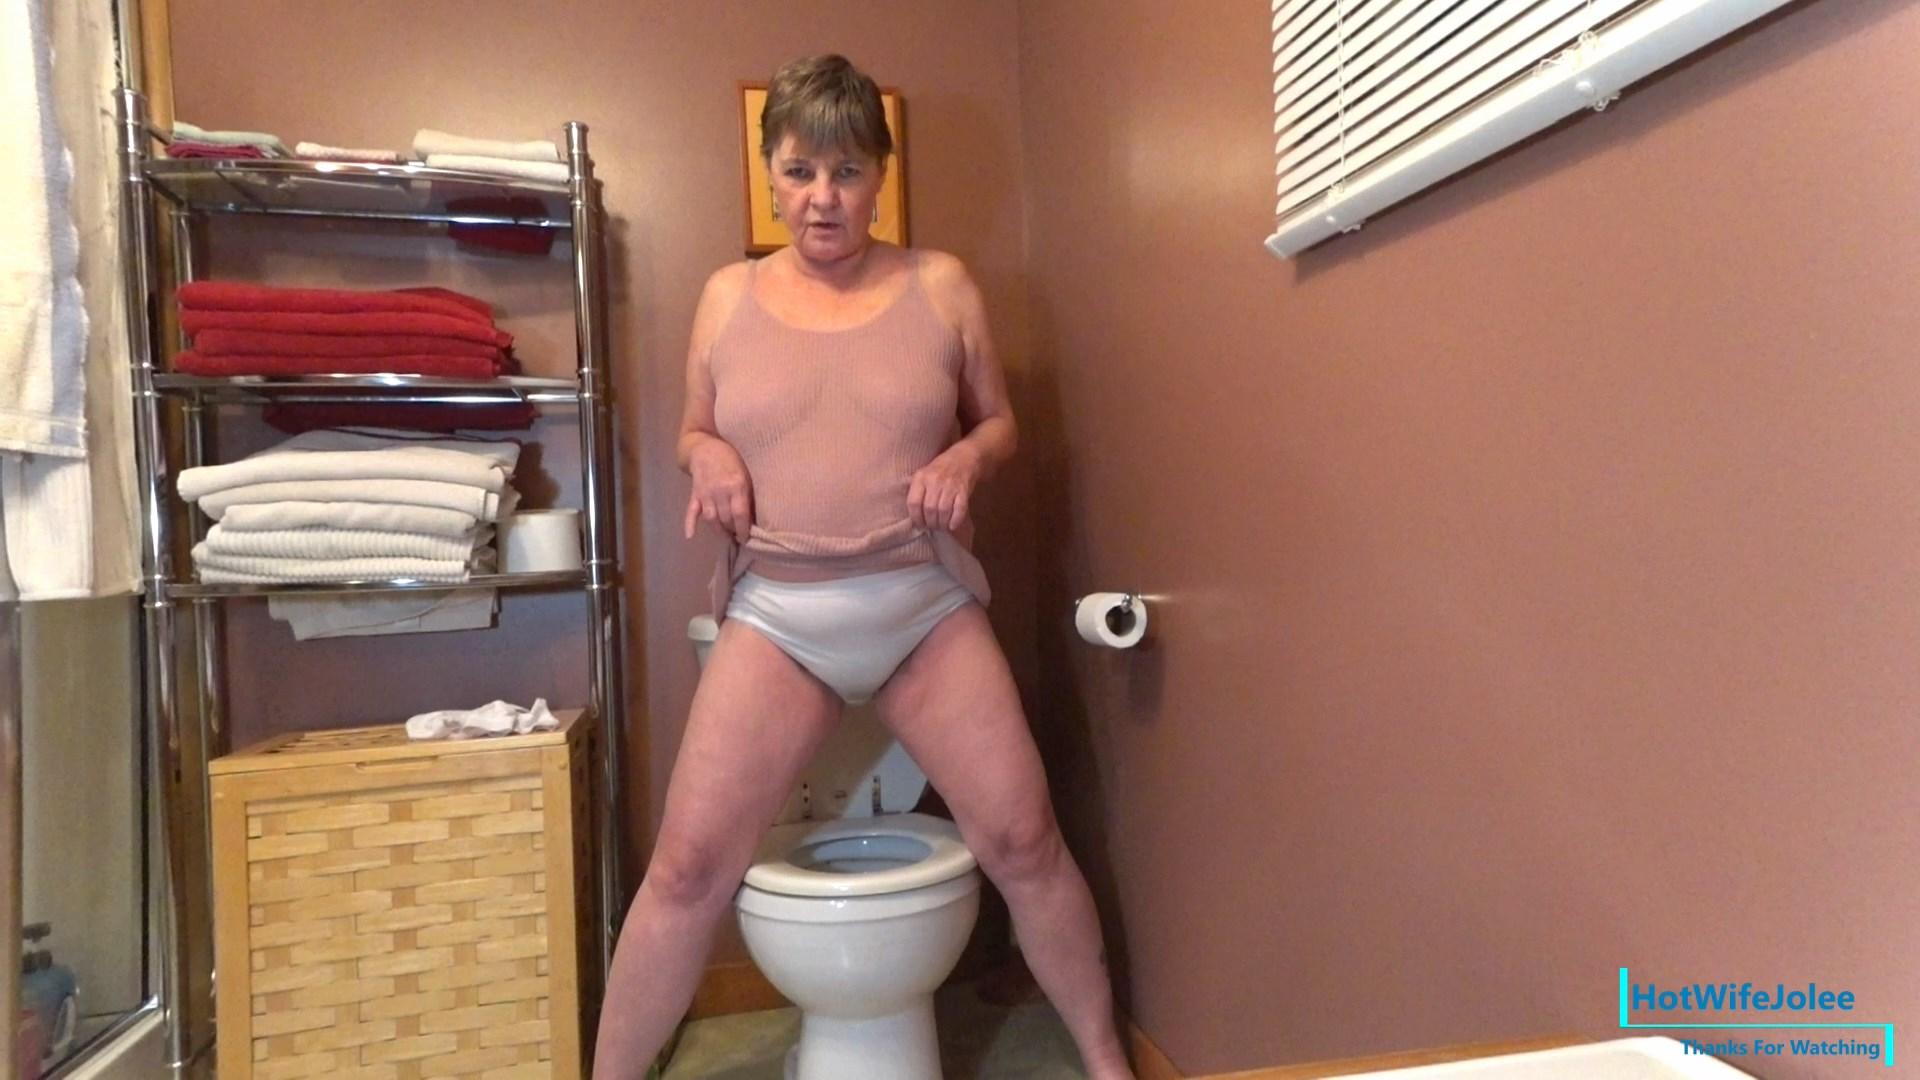 HotWifeJolee - Wet Pissy Panties Farts Toilet Slave